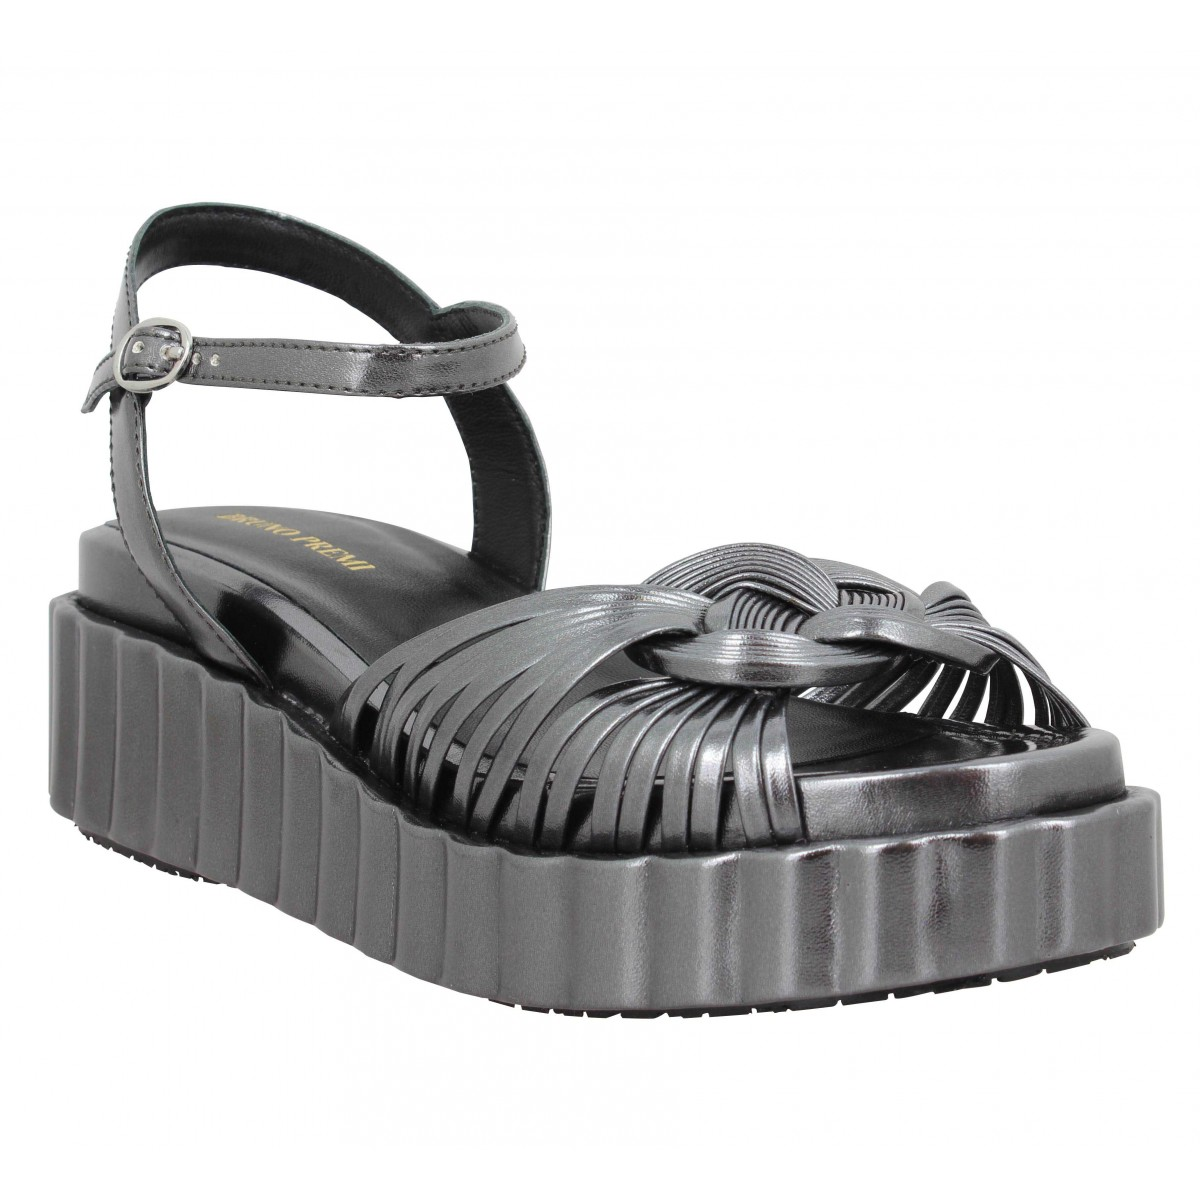 Sandales talons BRUNO PREMI 5304 metal Femme Anthracite